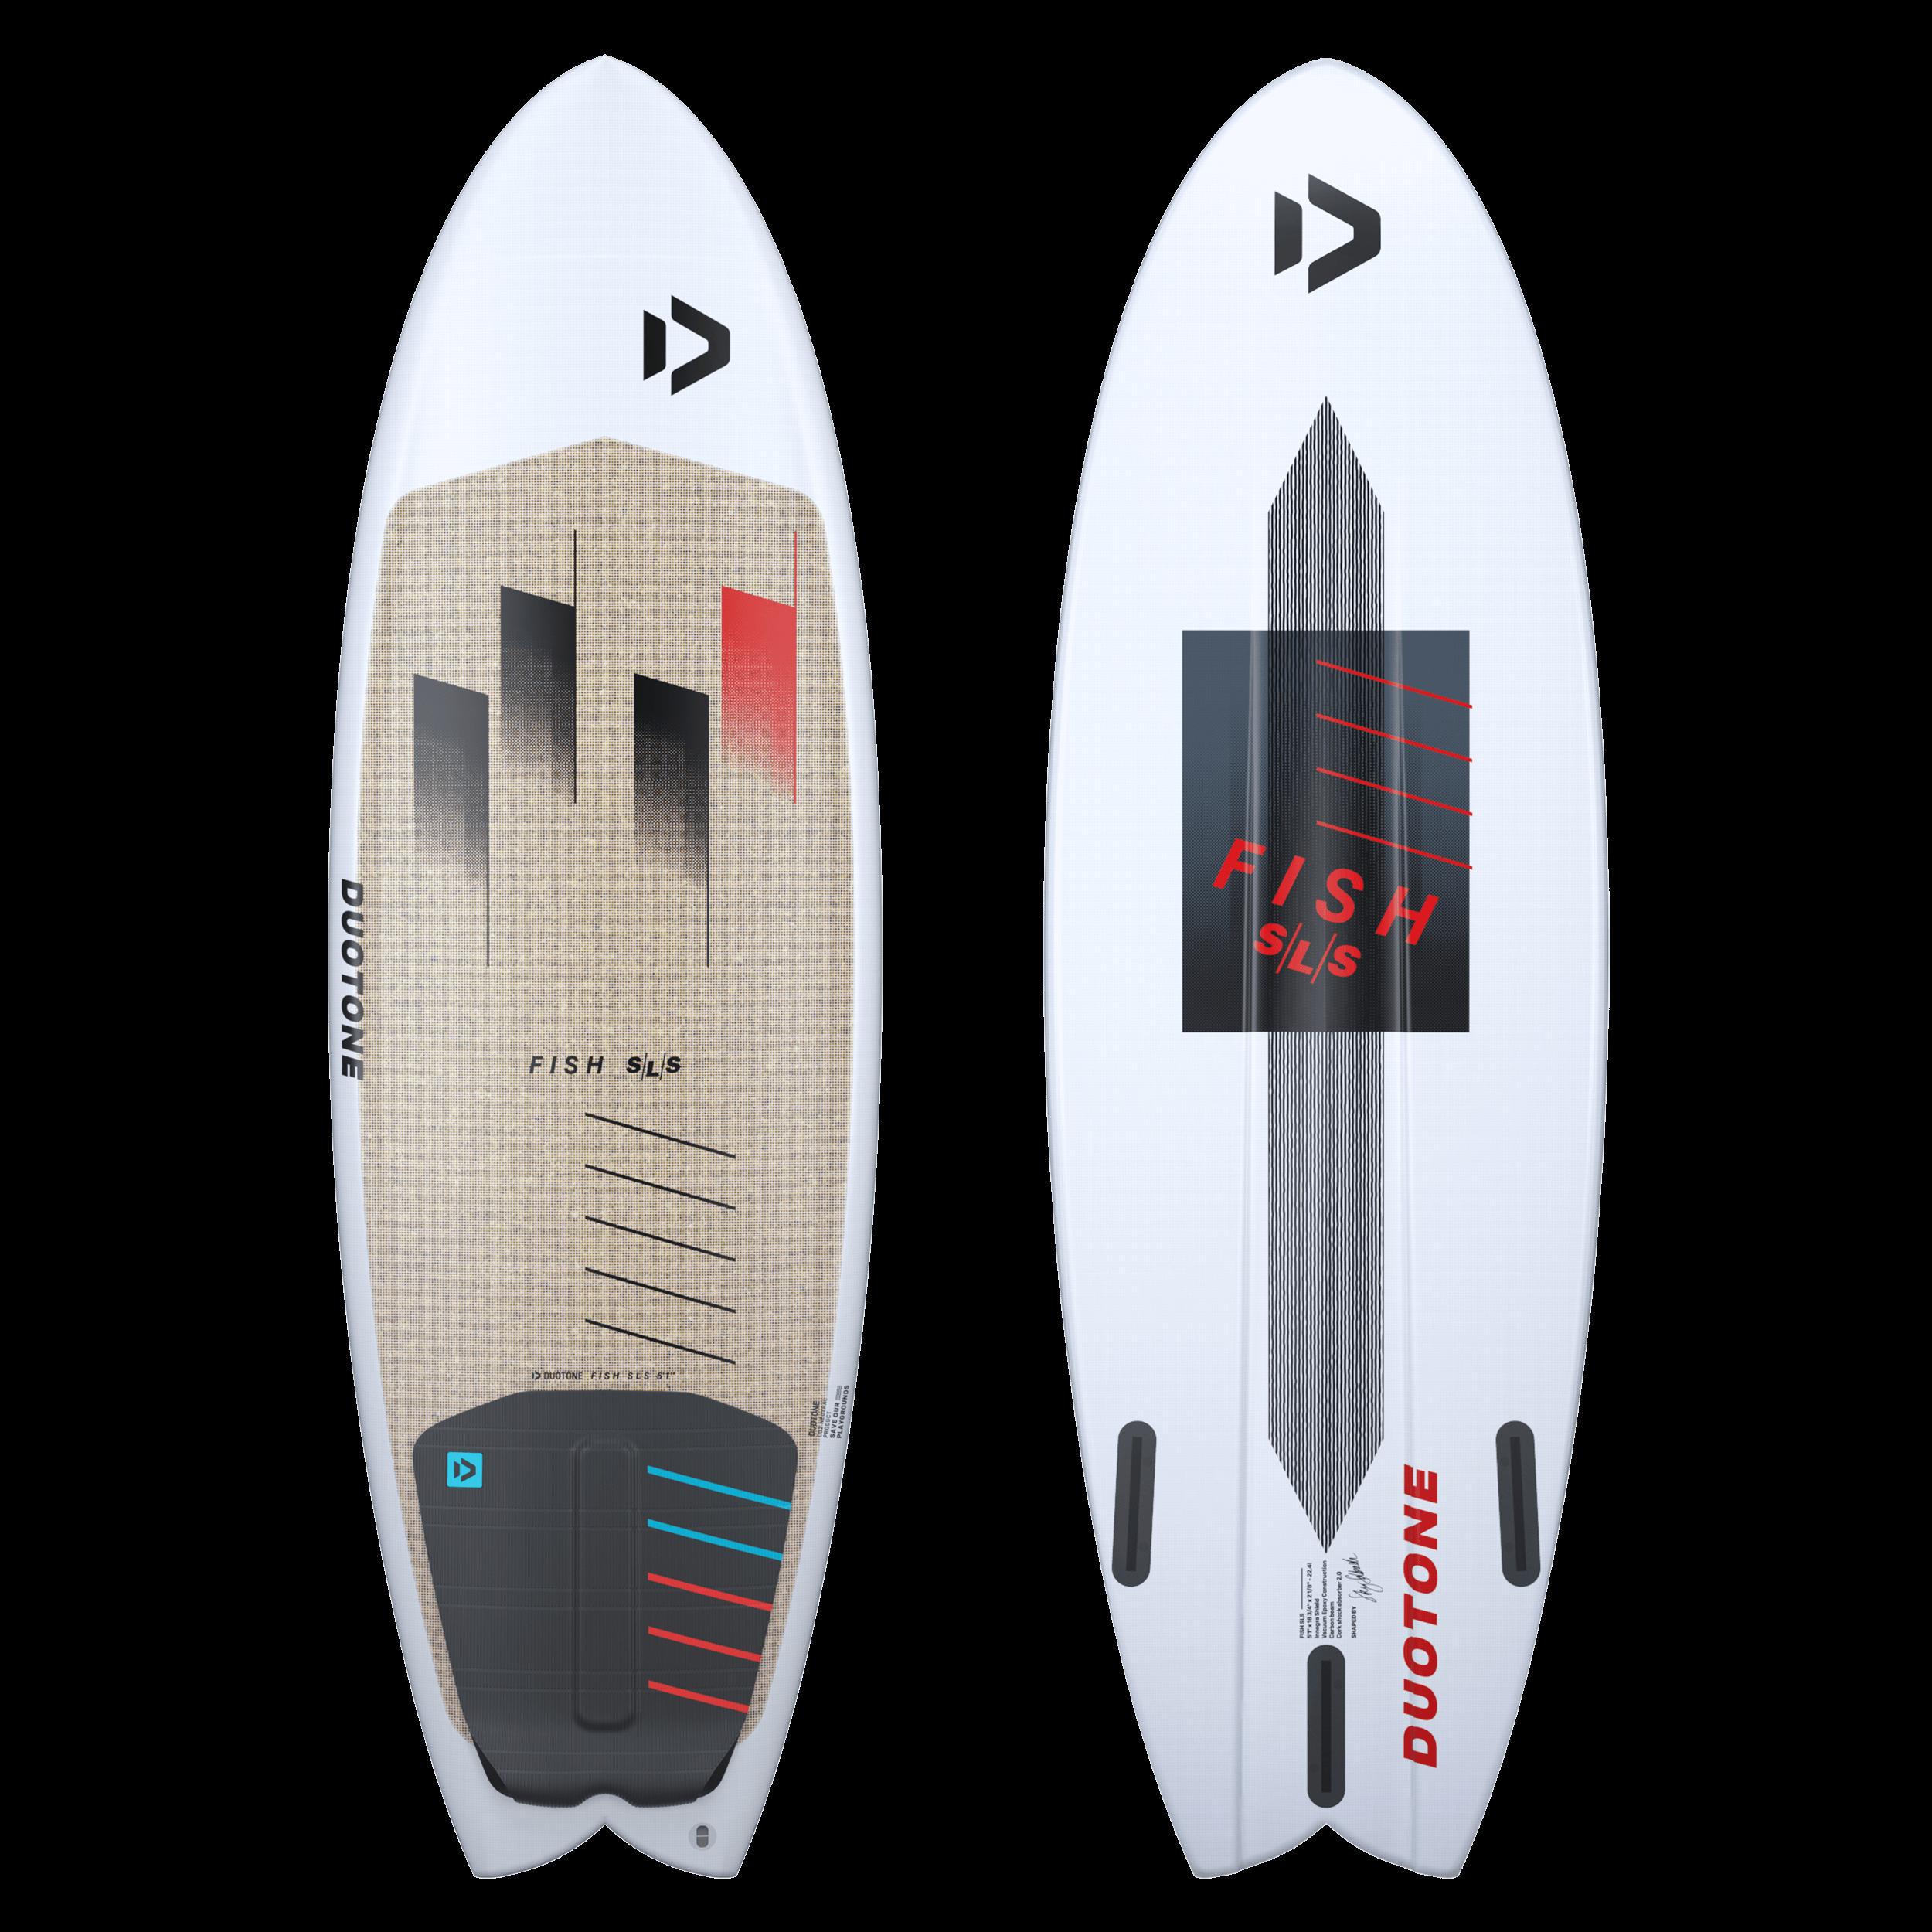 duotone kiteboarding fish sls tech features